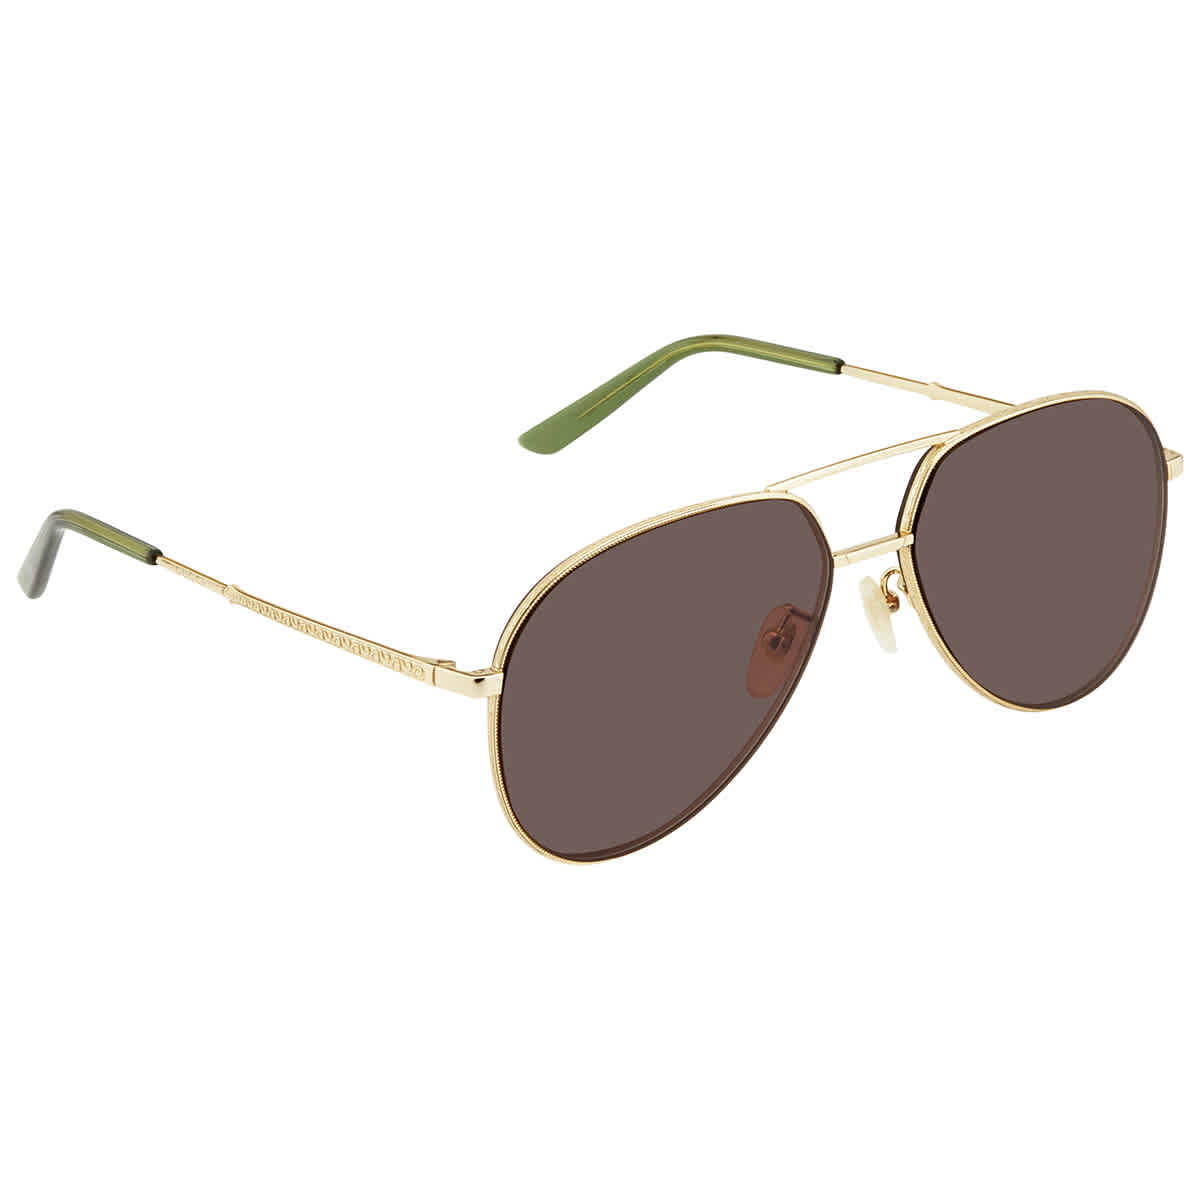 Gucci Brown Aviator Unisex Sunglasses 889652160467002 59